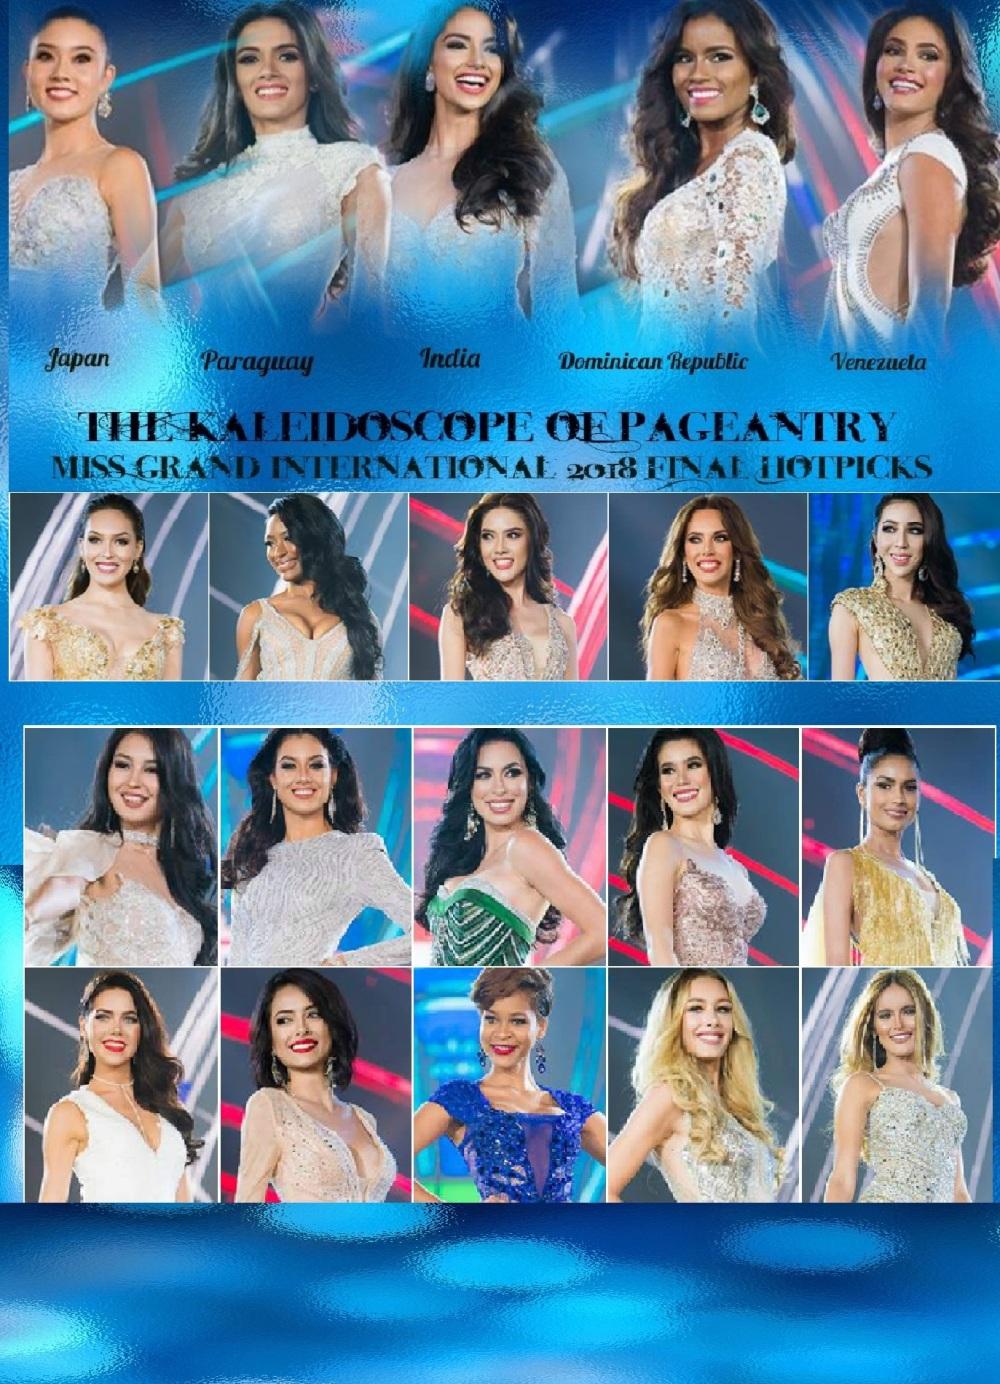 Miss Grand International 2018 Final Hotpicks.jpg